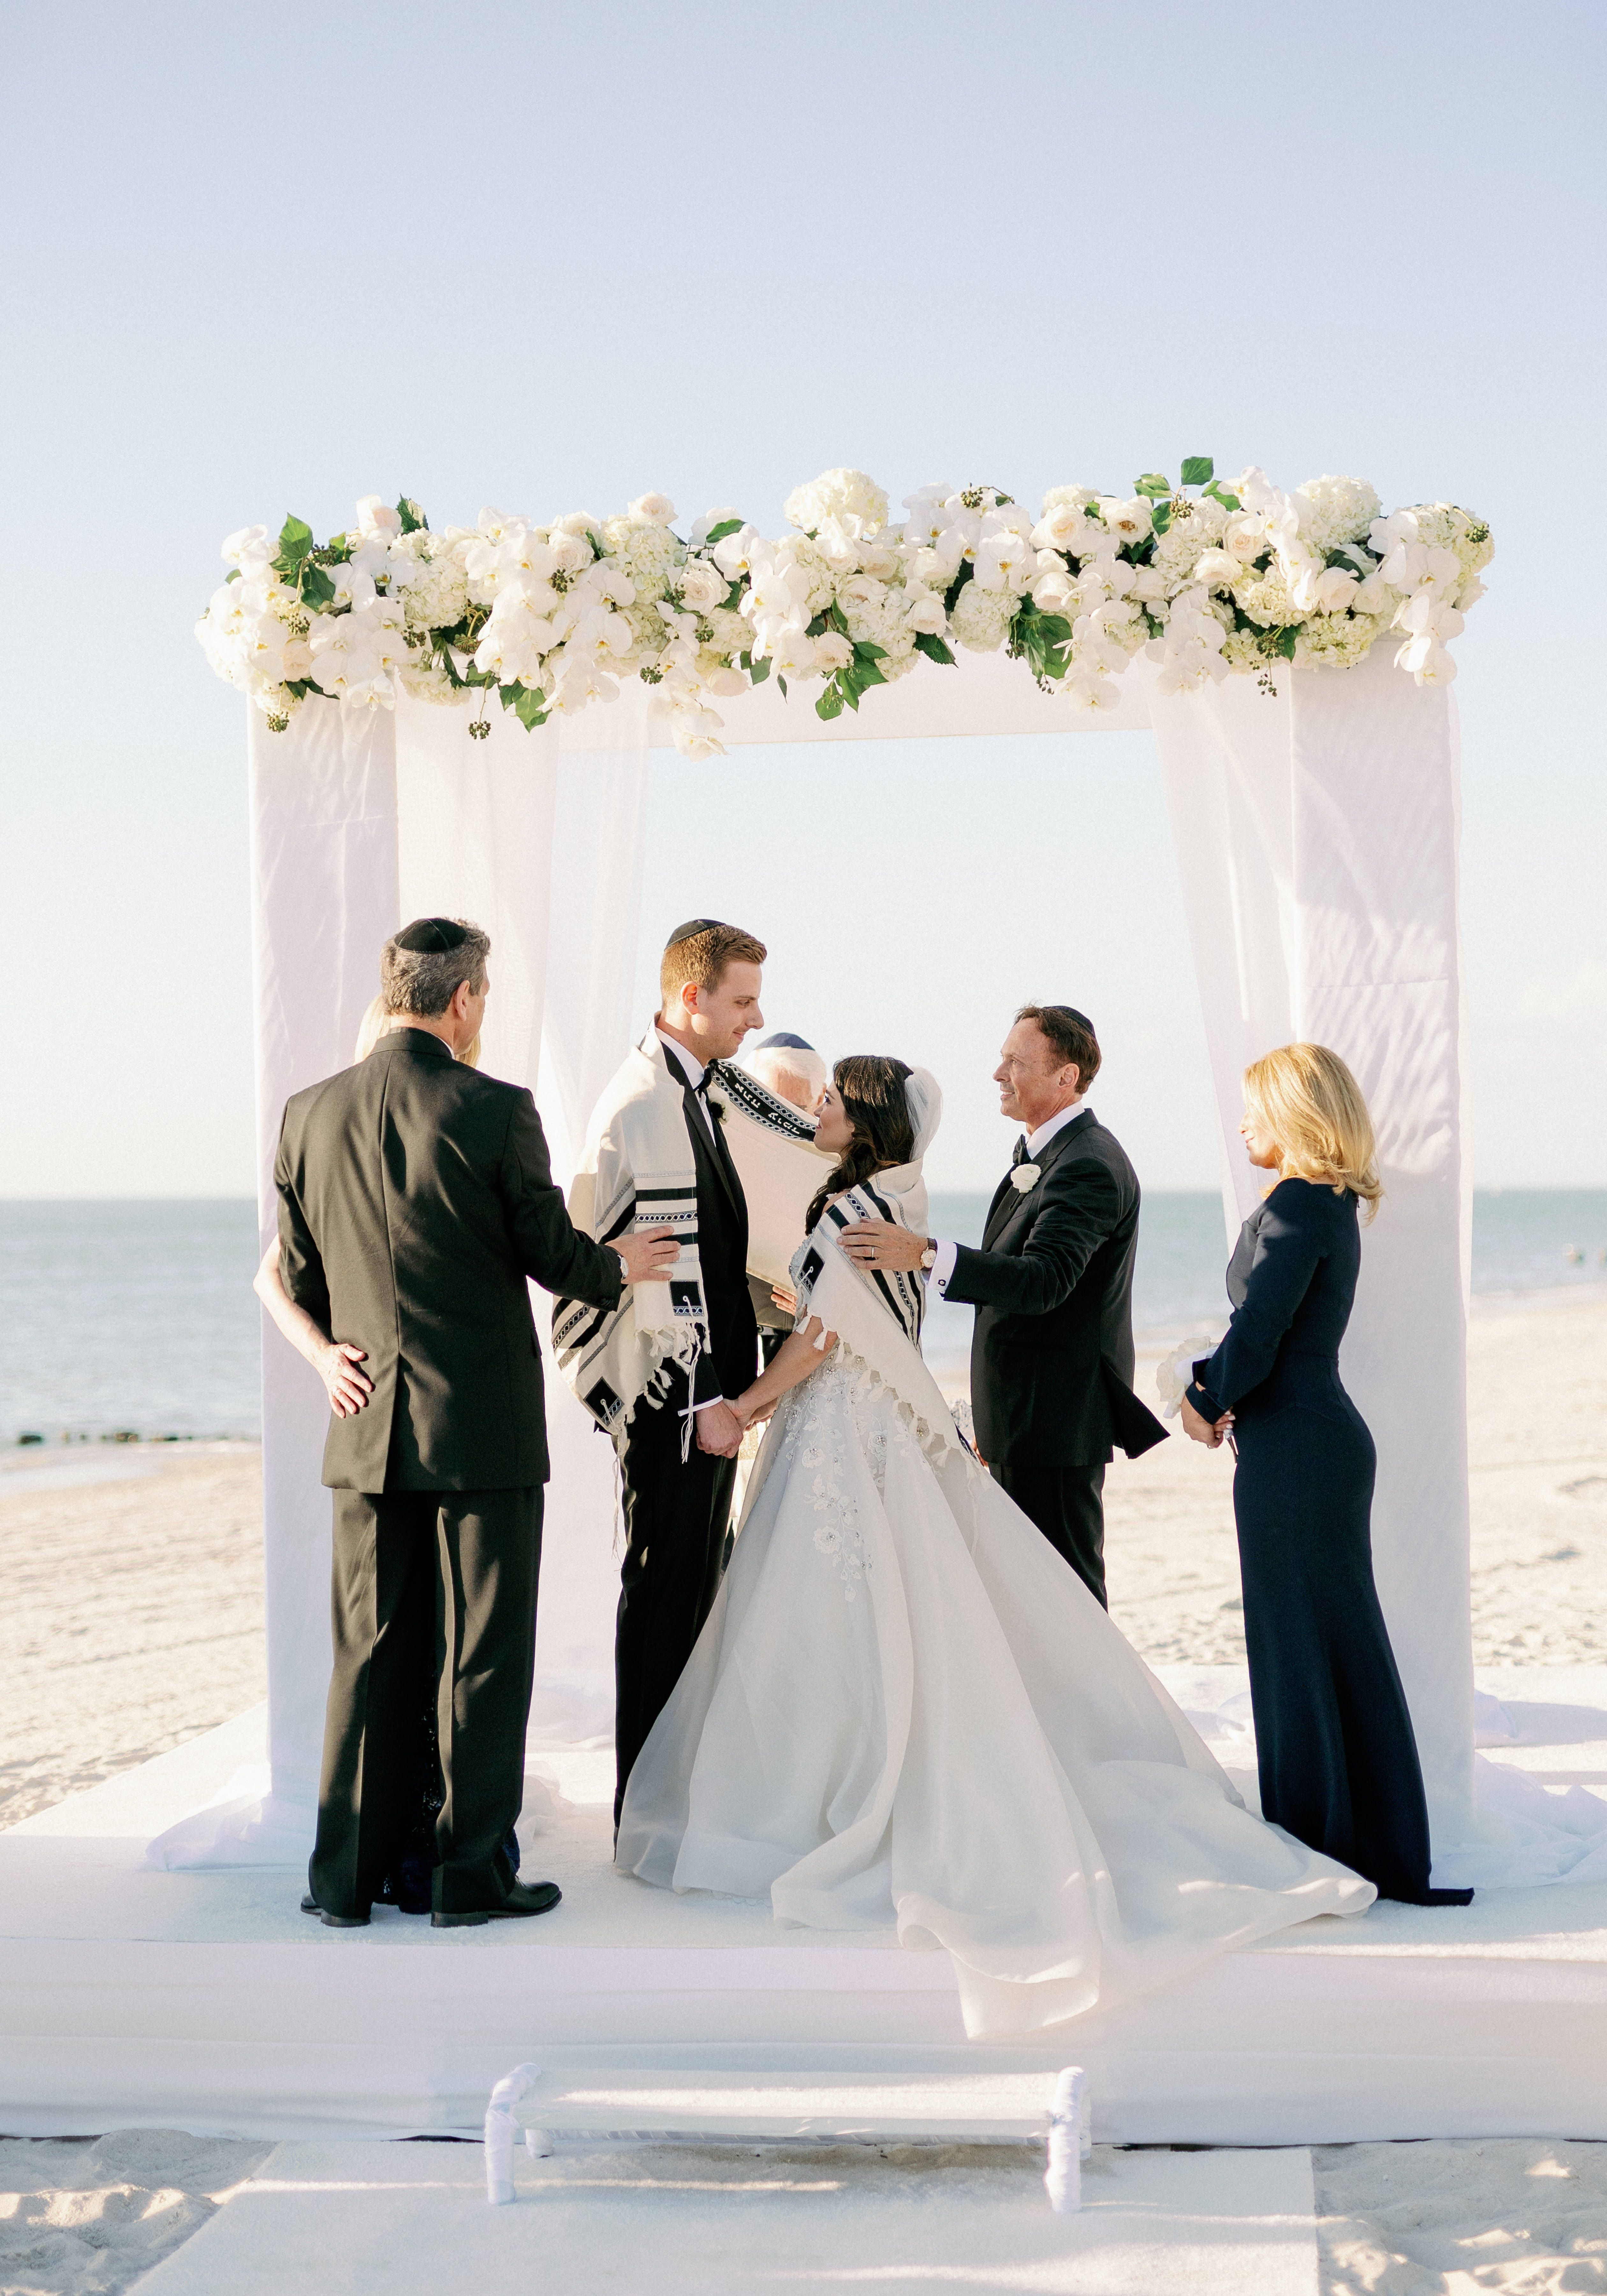 Wedding Ceremony In 2020 Destination Wedding Destination Wedding Planner Wedding Planner